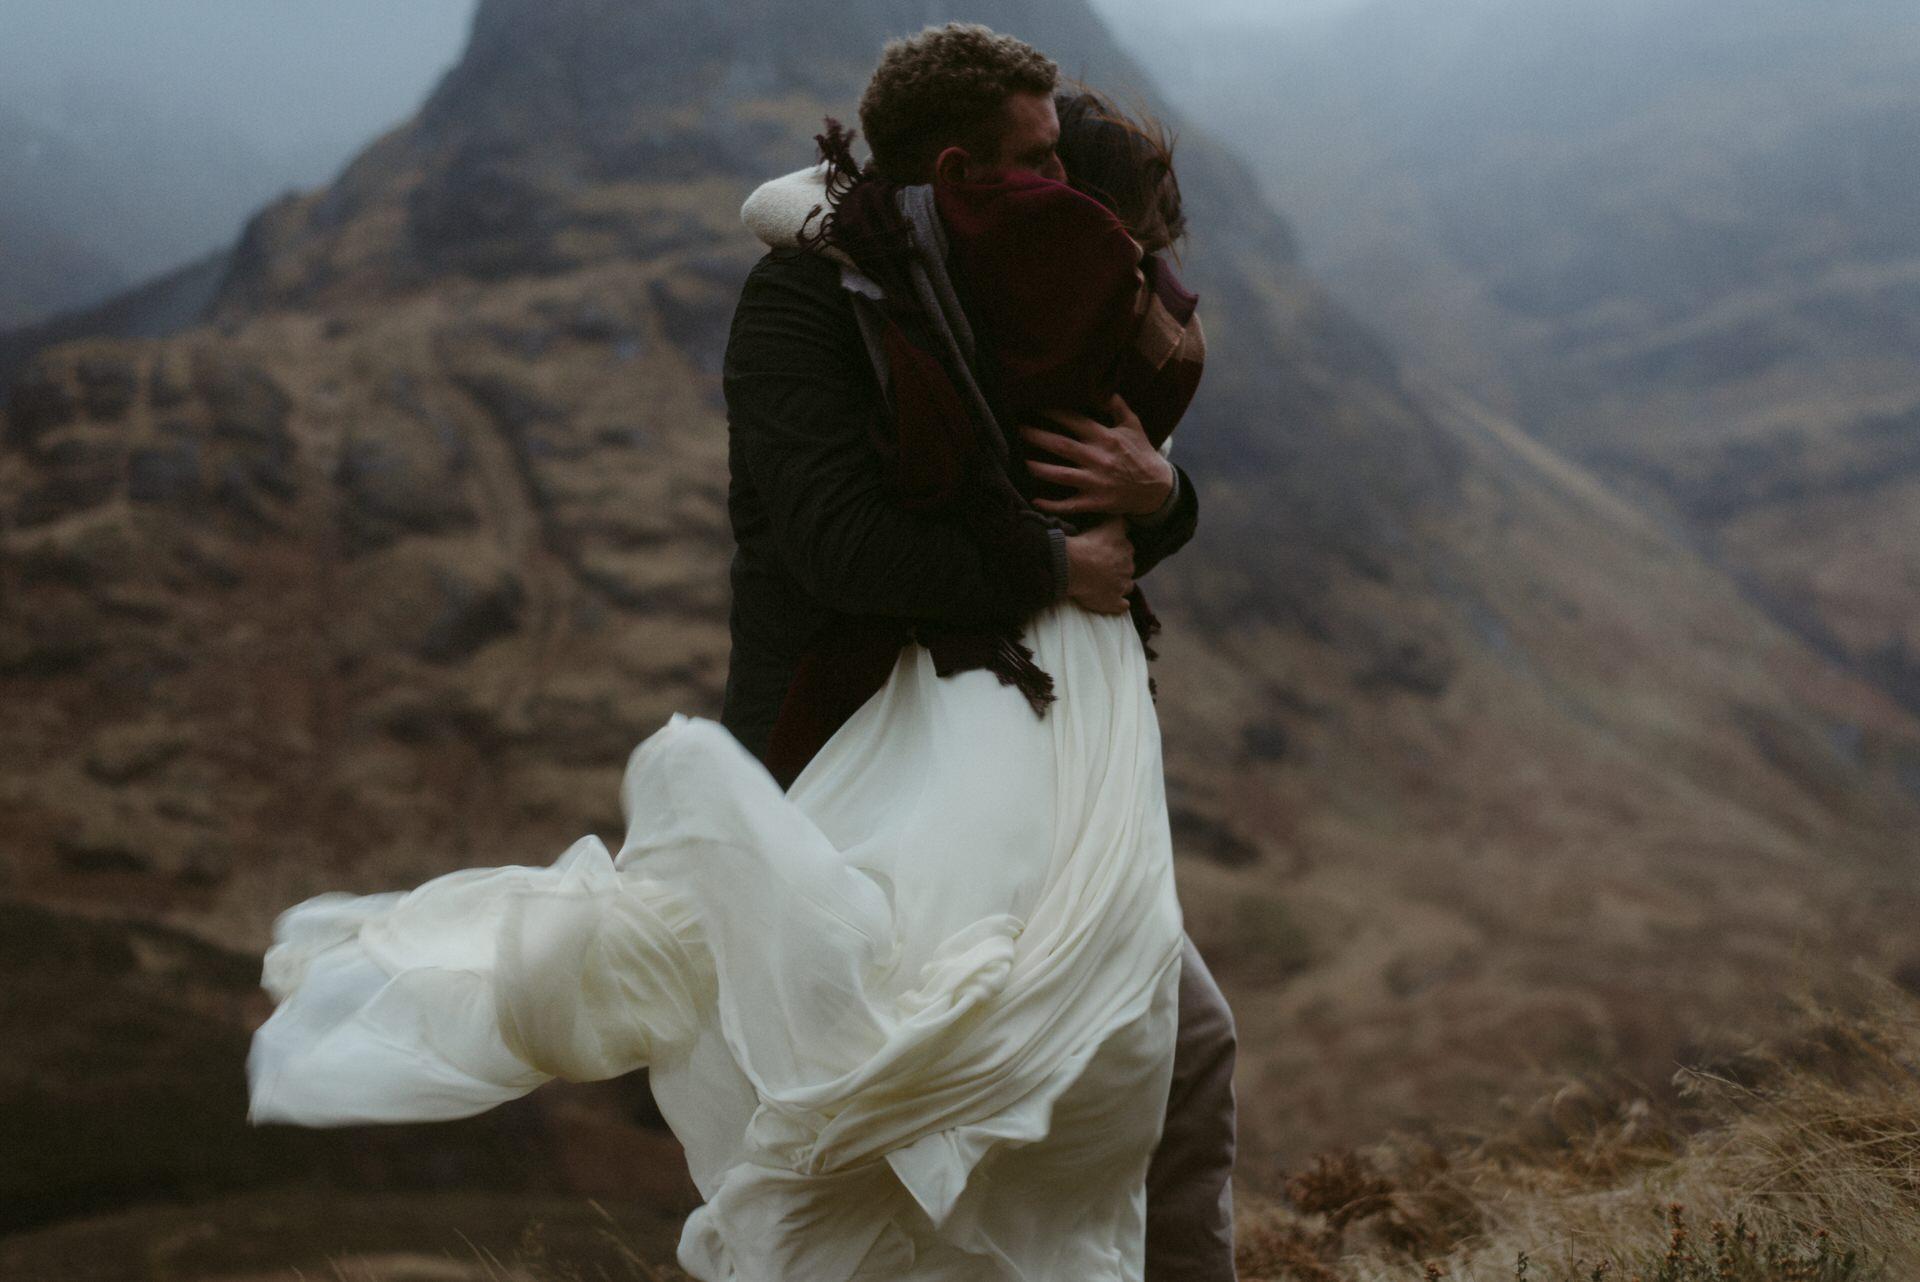 Surprise-Marriage-Proposal-Glencoe_67